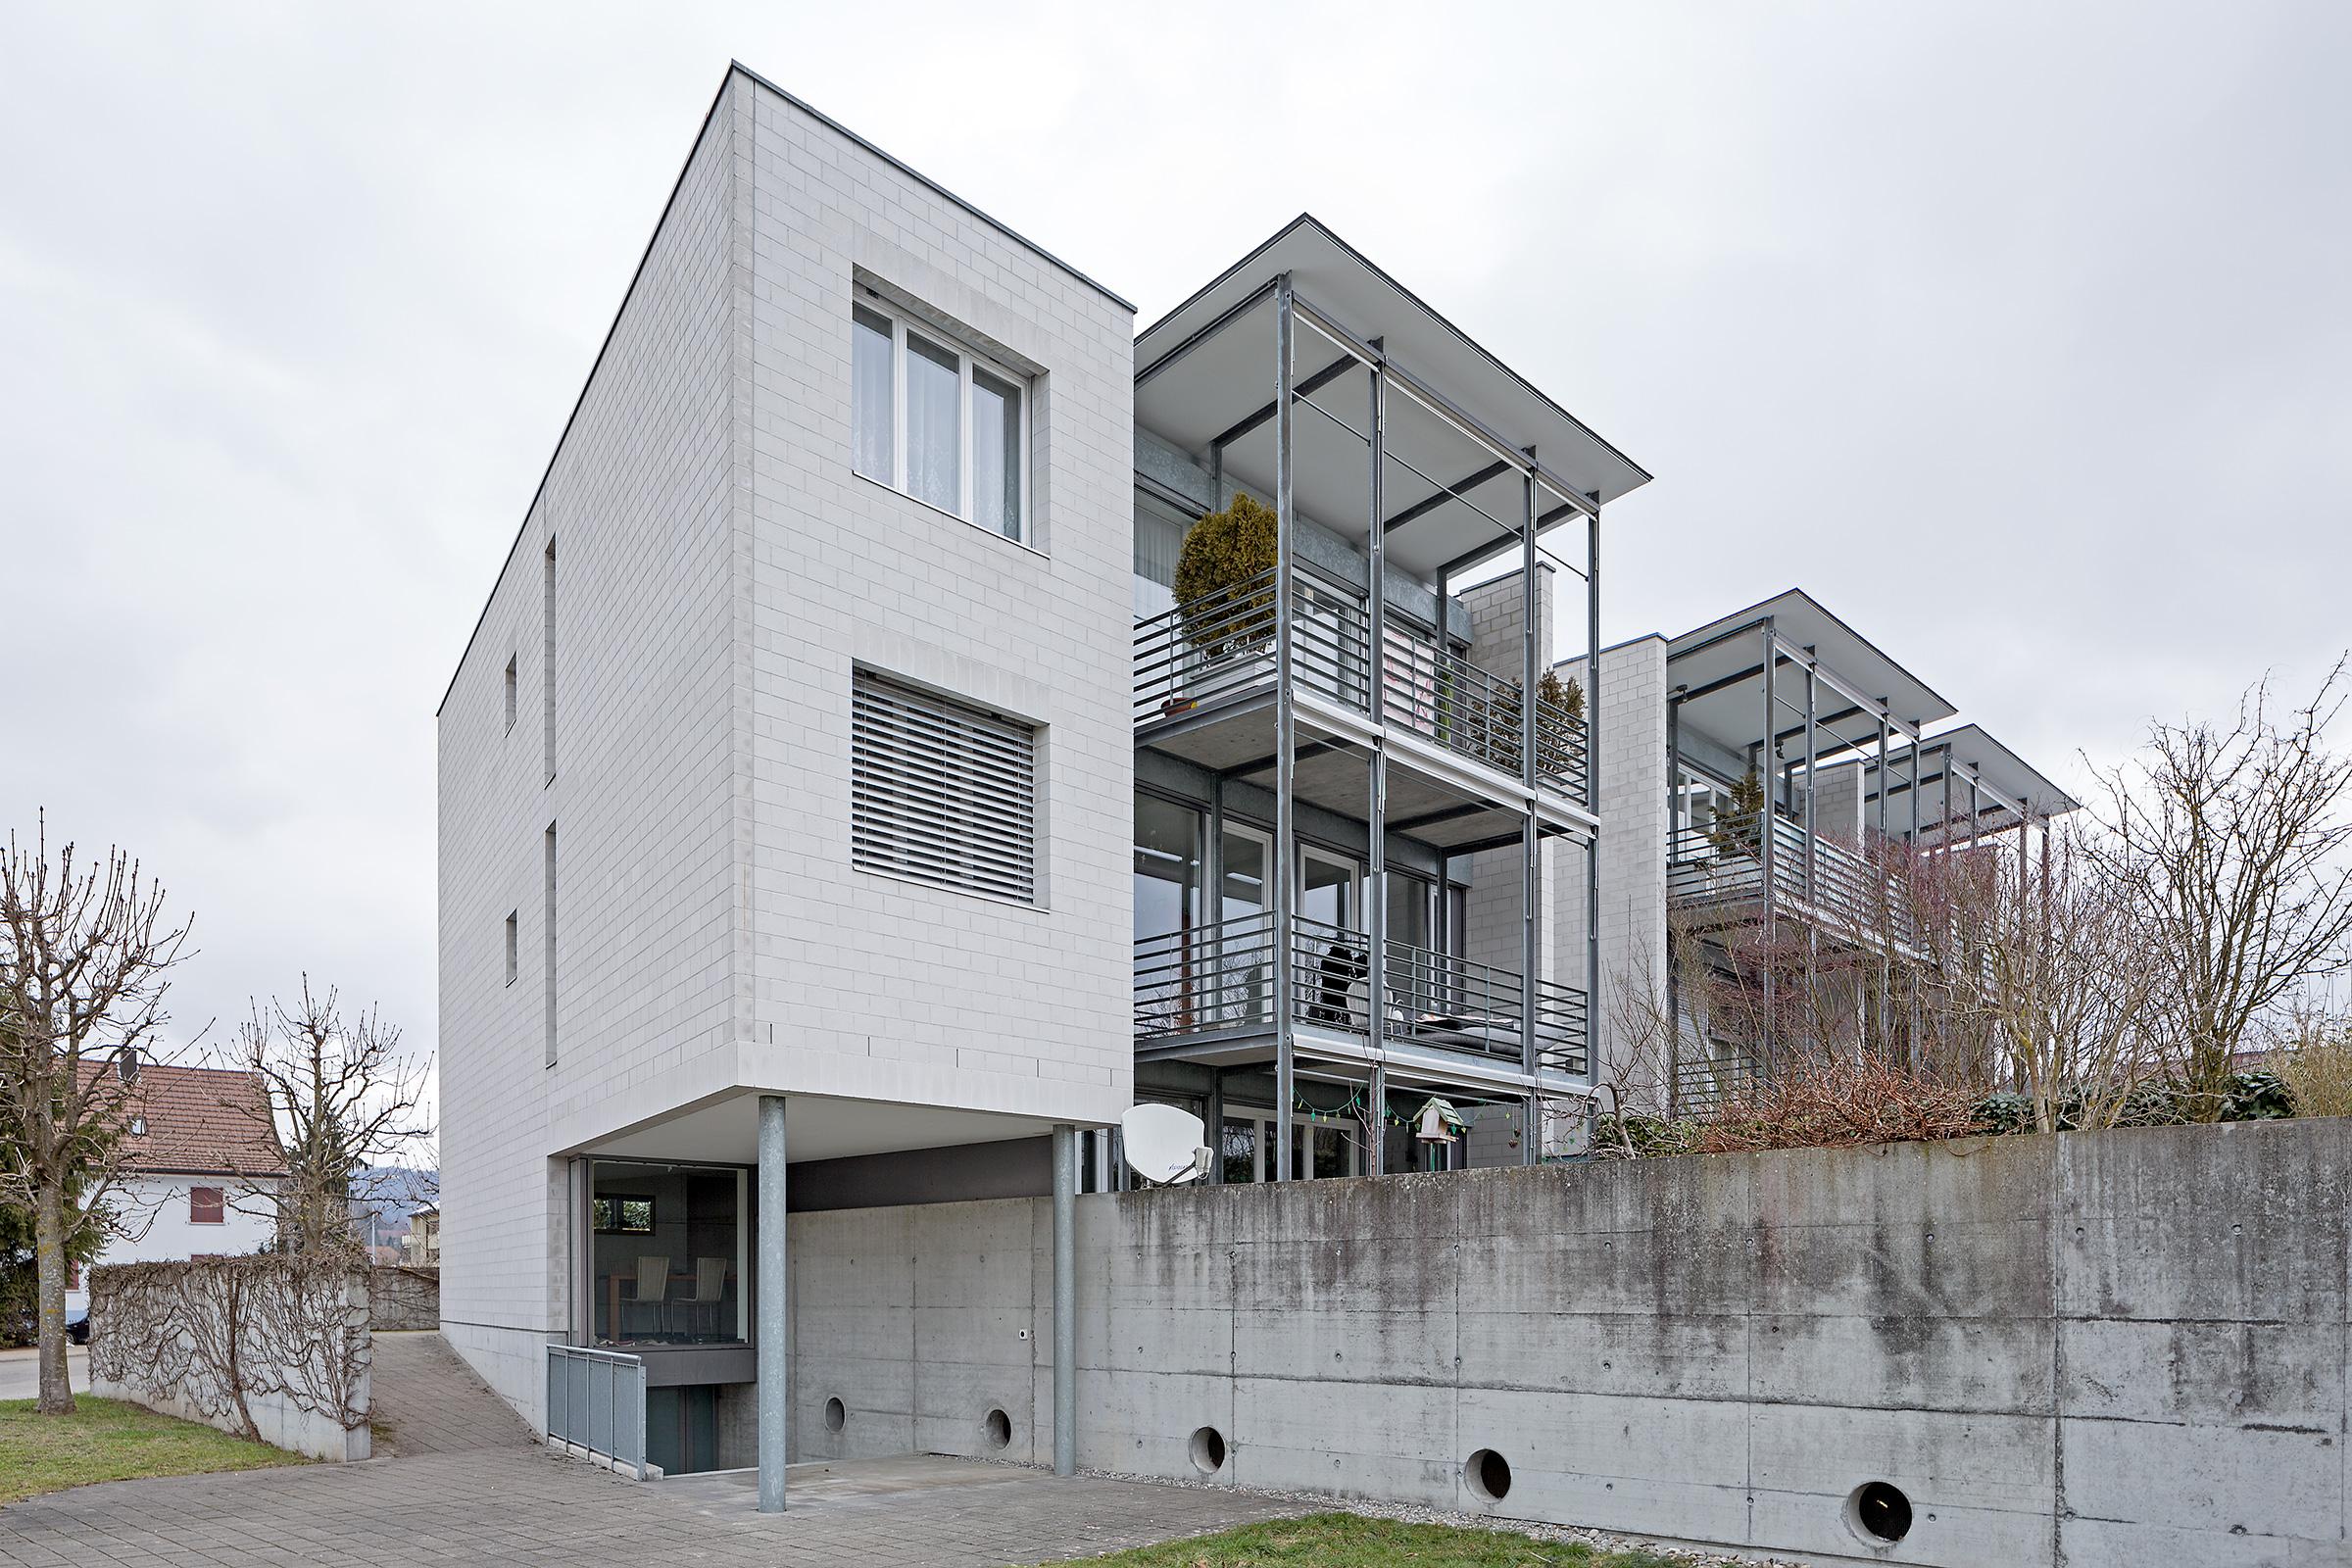 8606 Siedlung Netzi